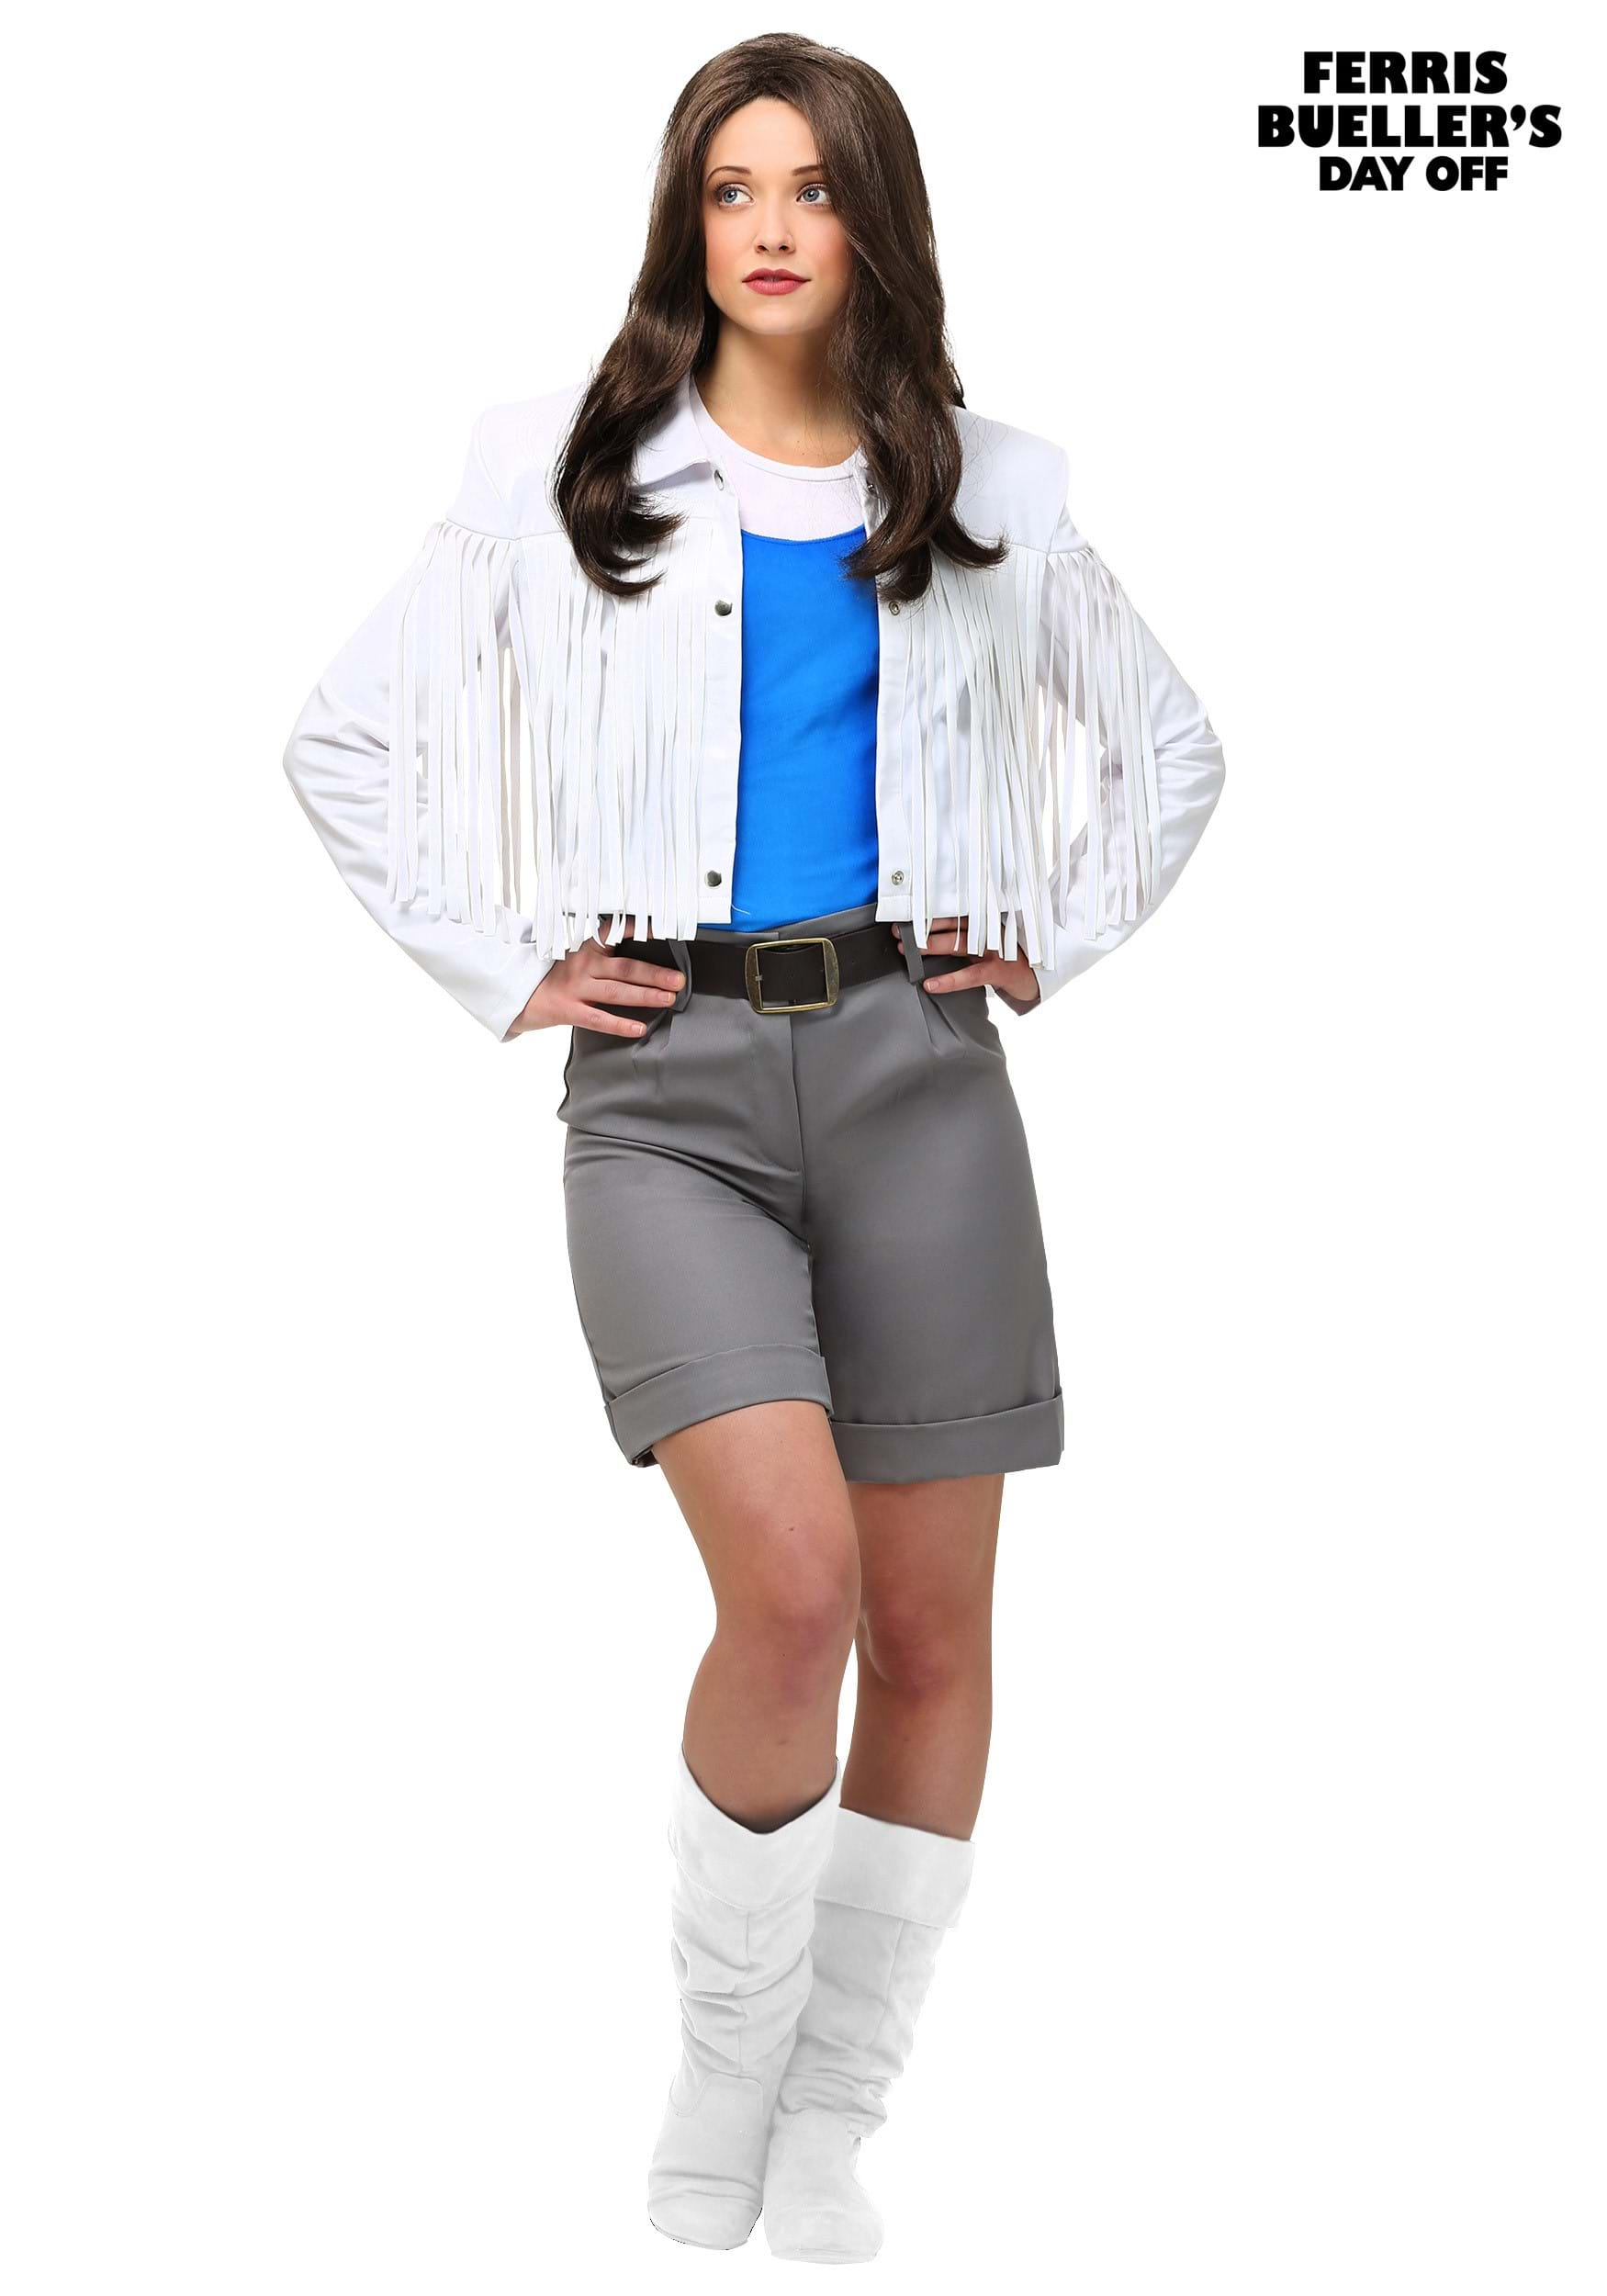 Women S Sloane Peterson Costume Ferris Bueller S Day Off